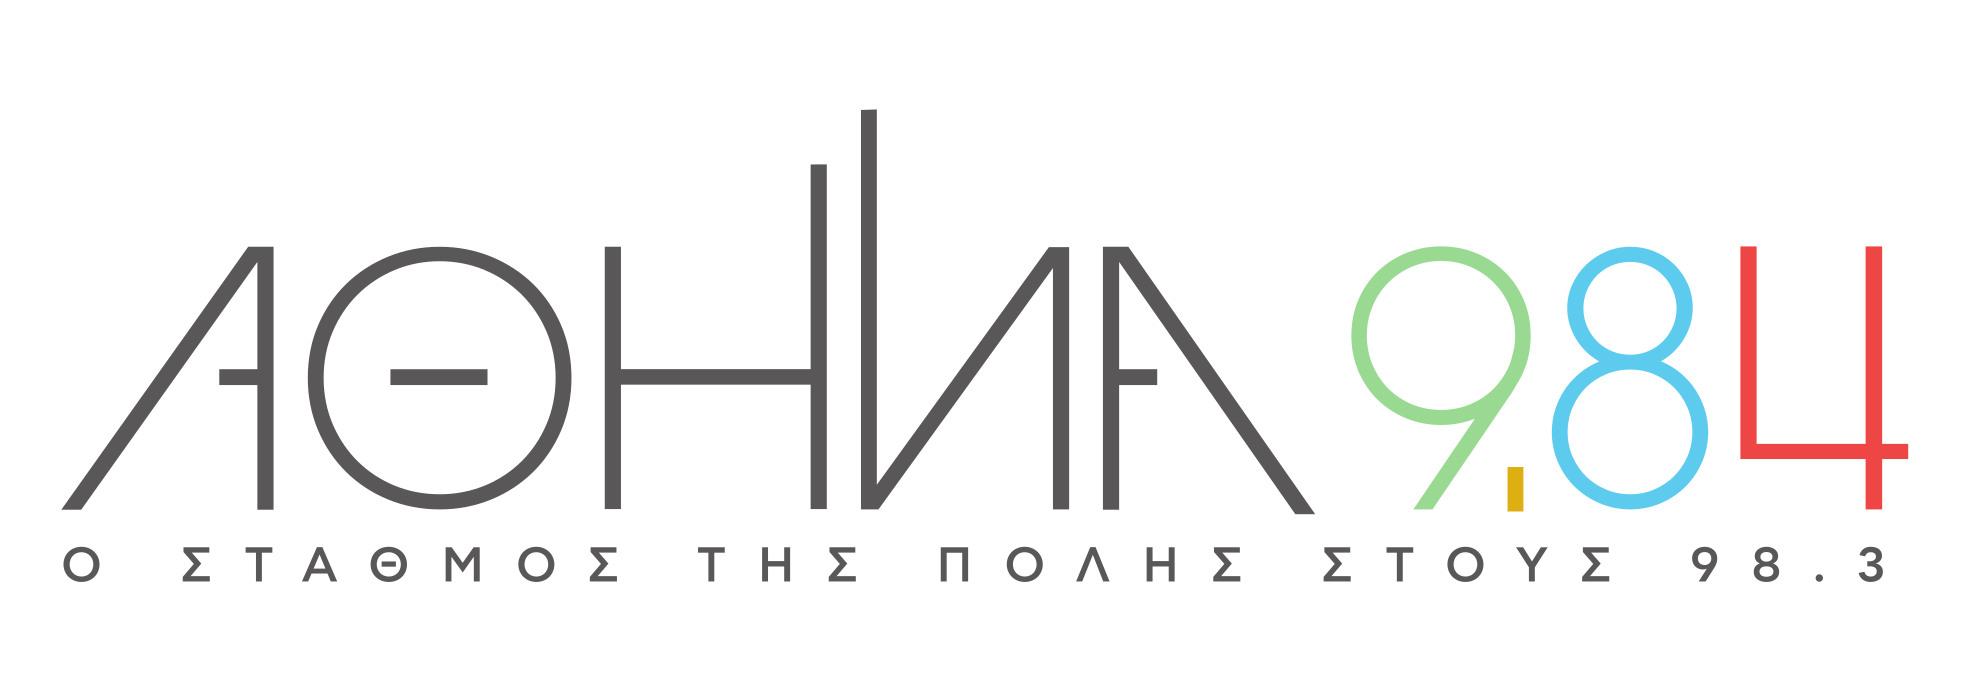 984 new logo